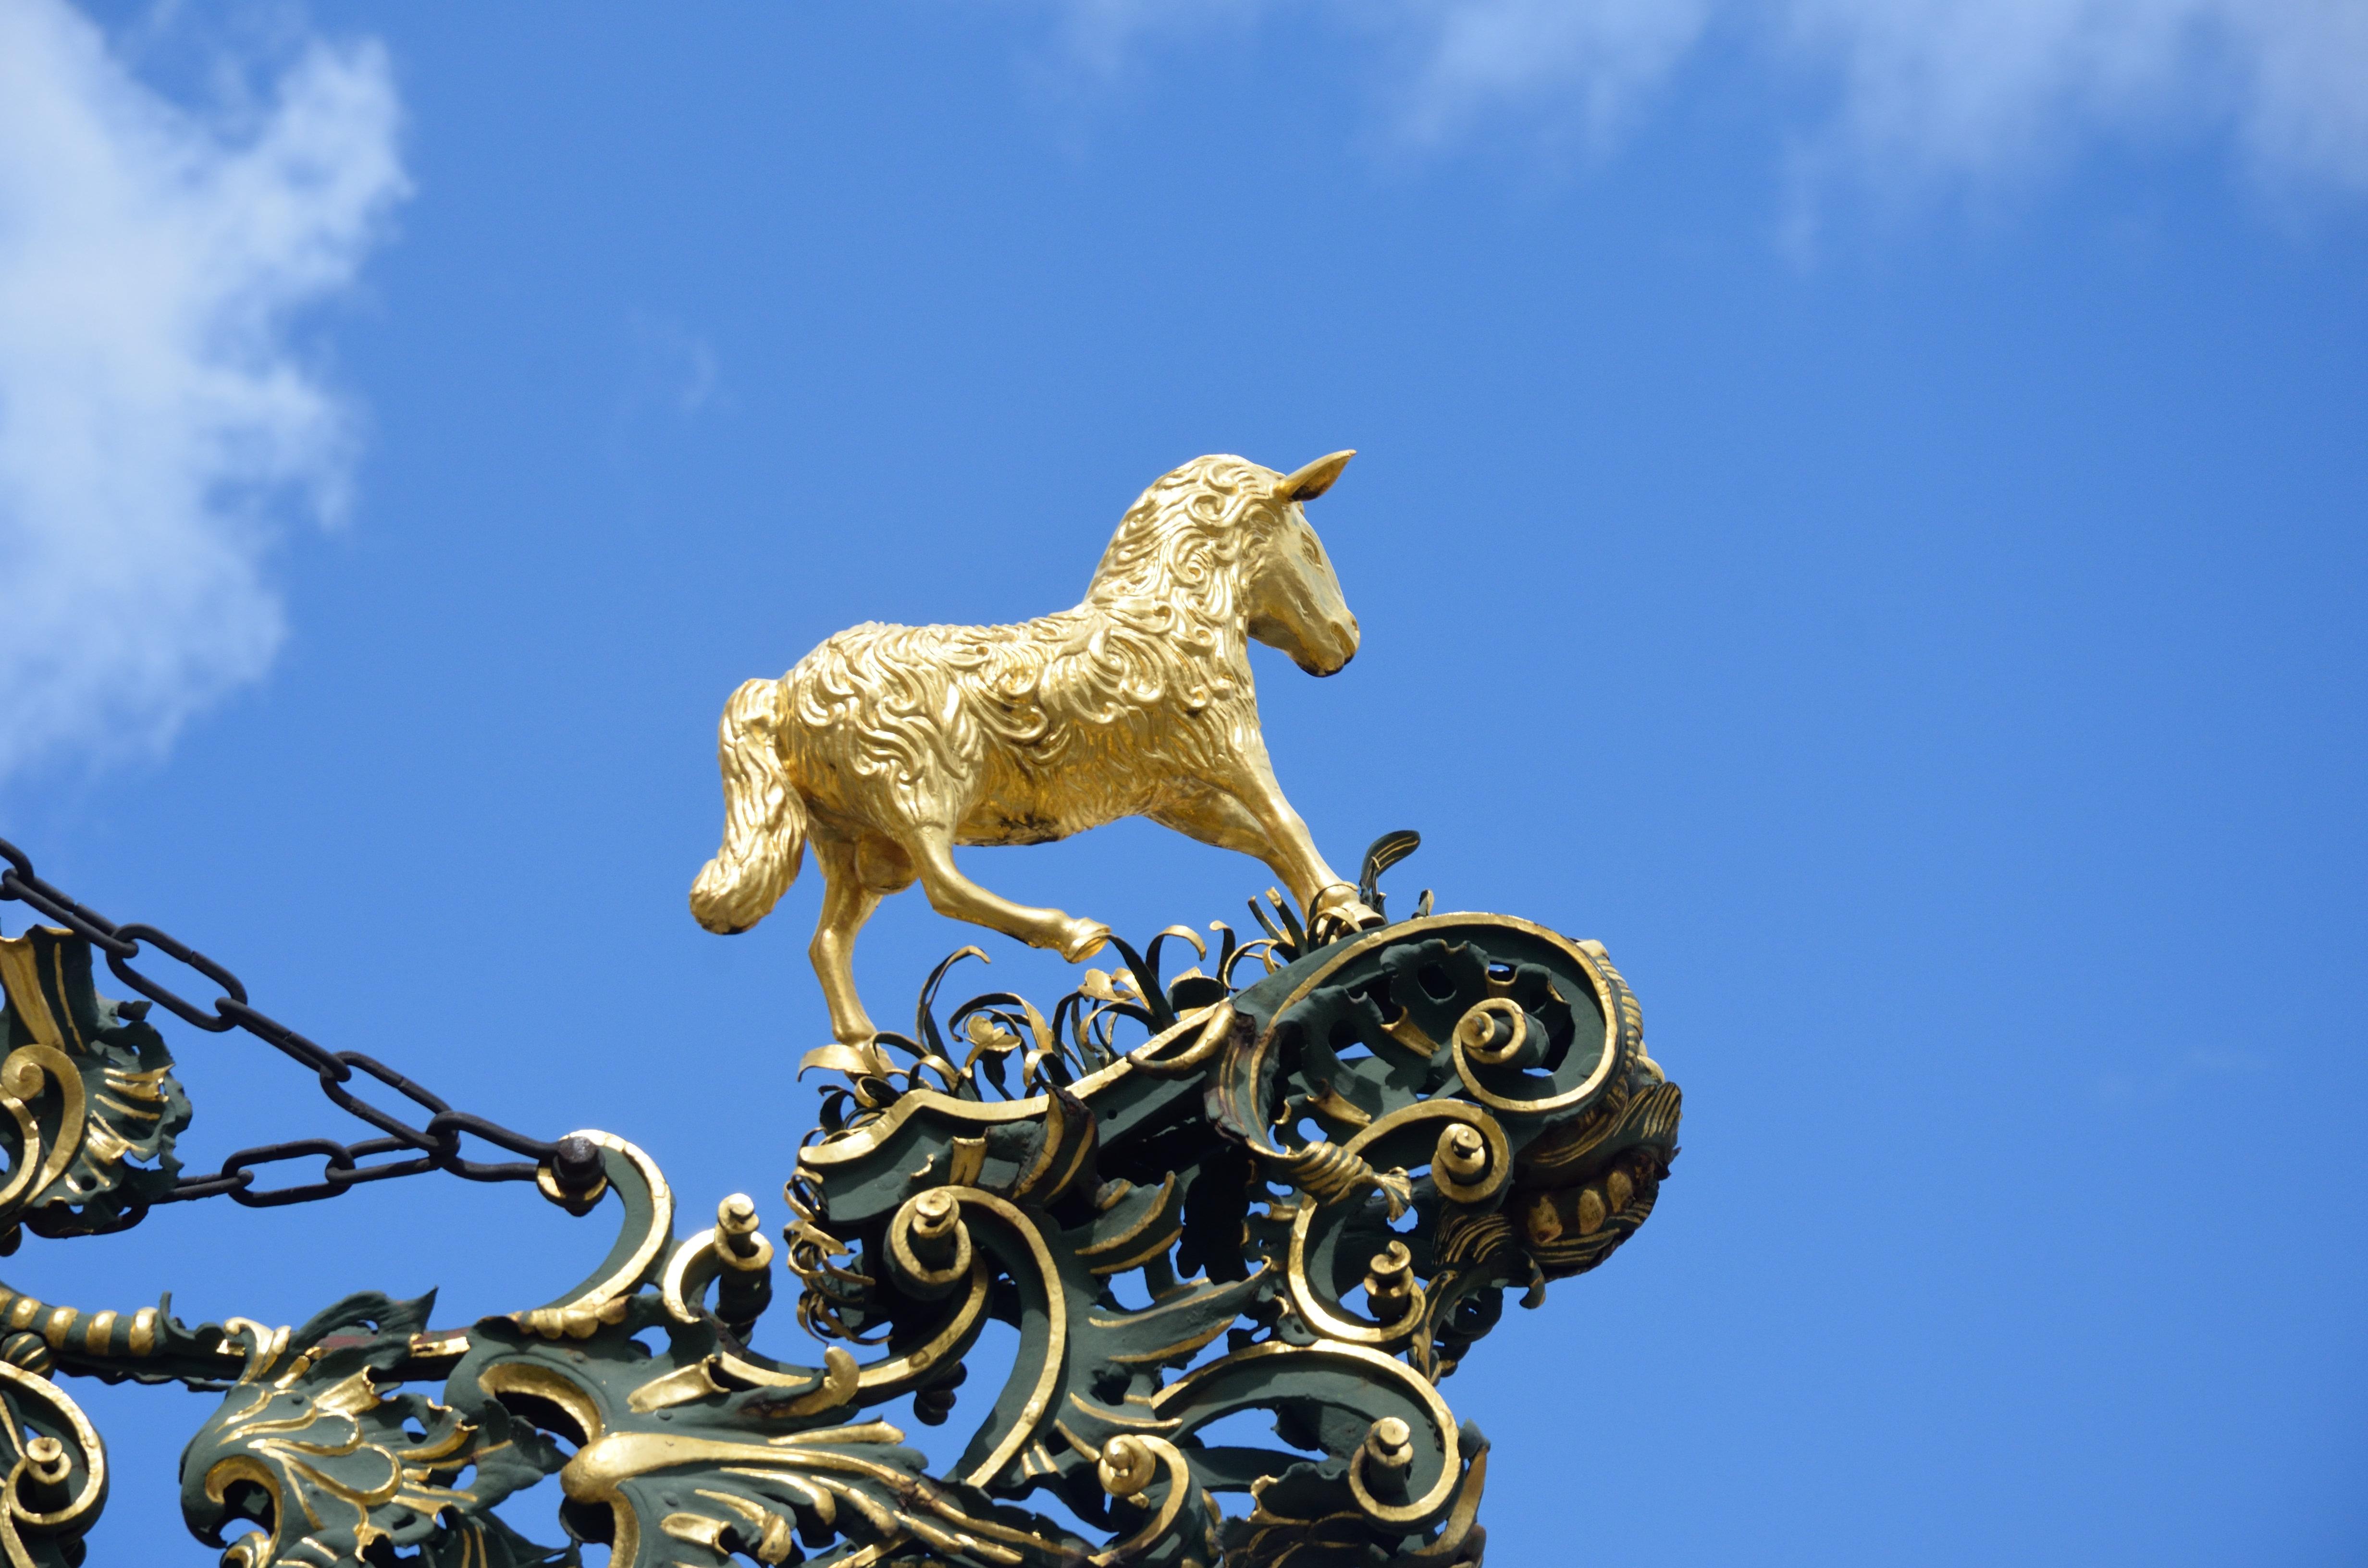 What The Golden Fleece Is Greek Mythology